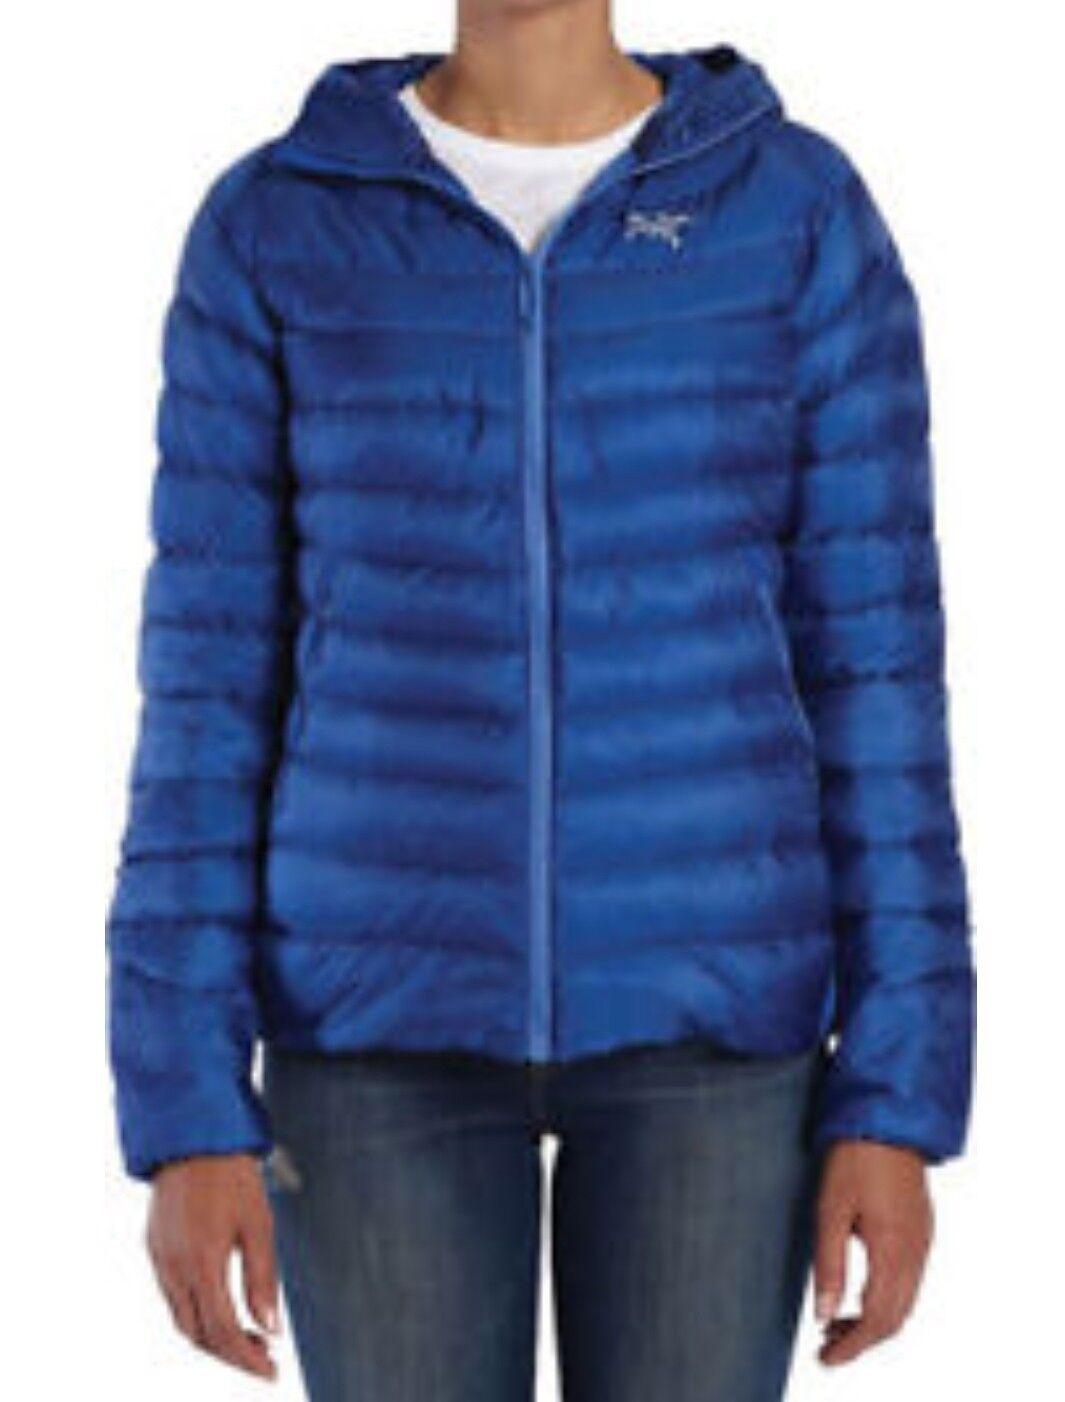 Arcteryx Women's Cerium  LT Hoody - Somerset bluee - Large - RRP  - NWT  online-shop